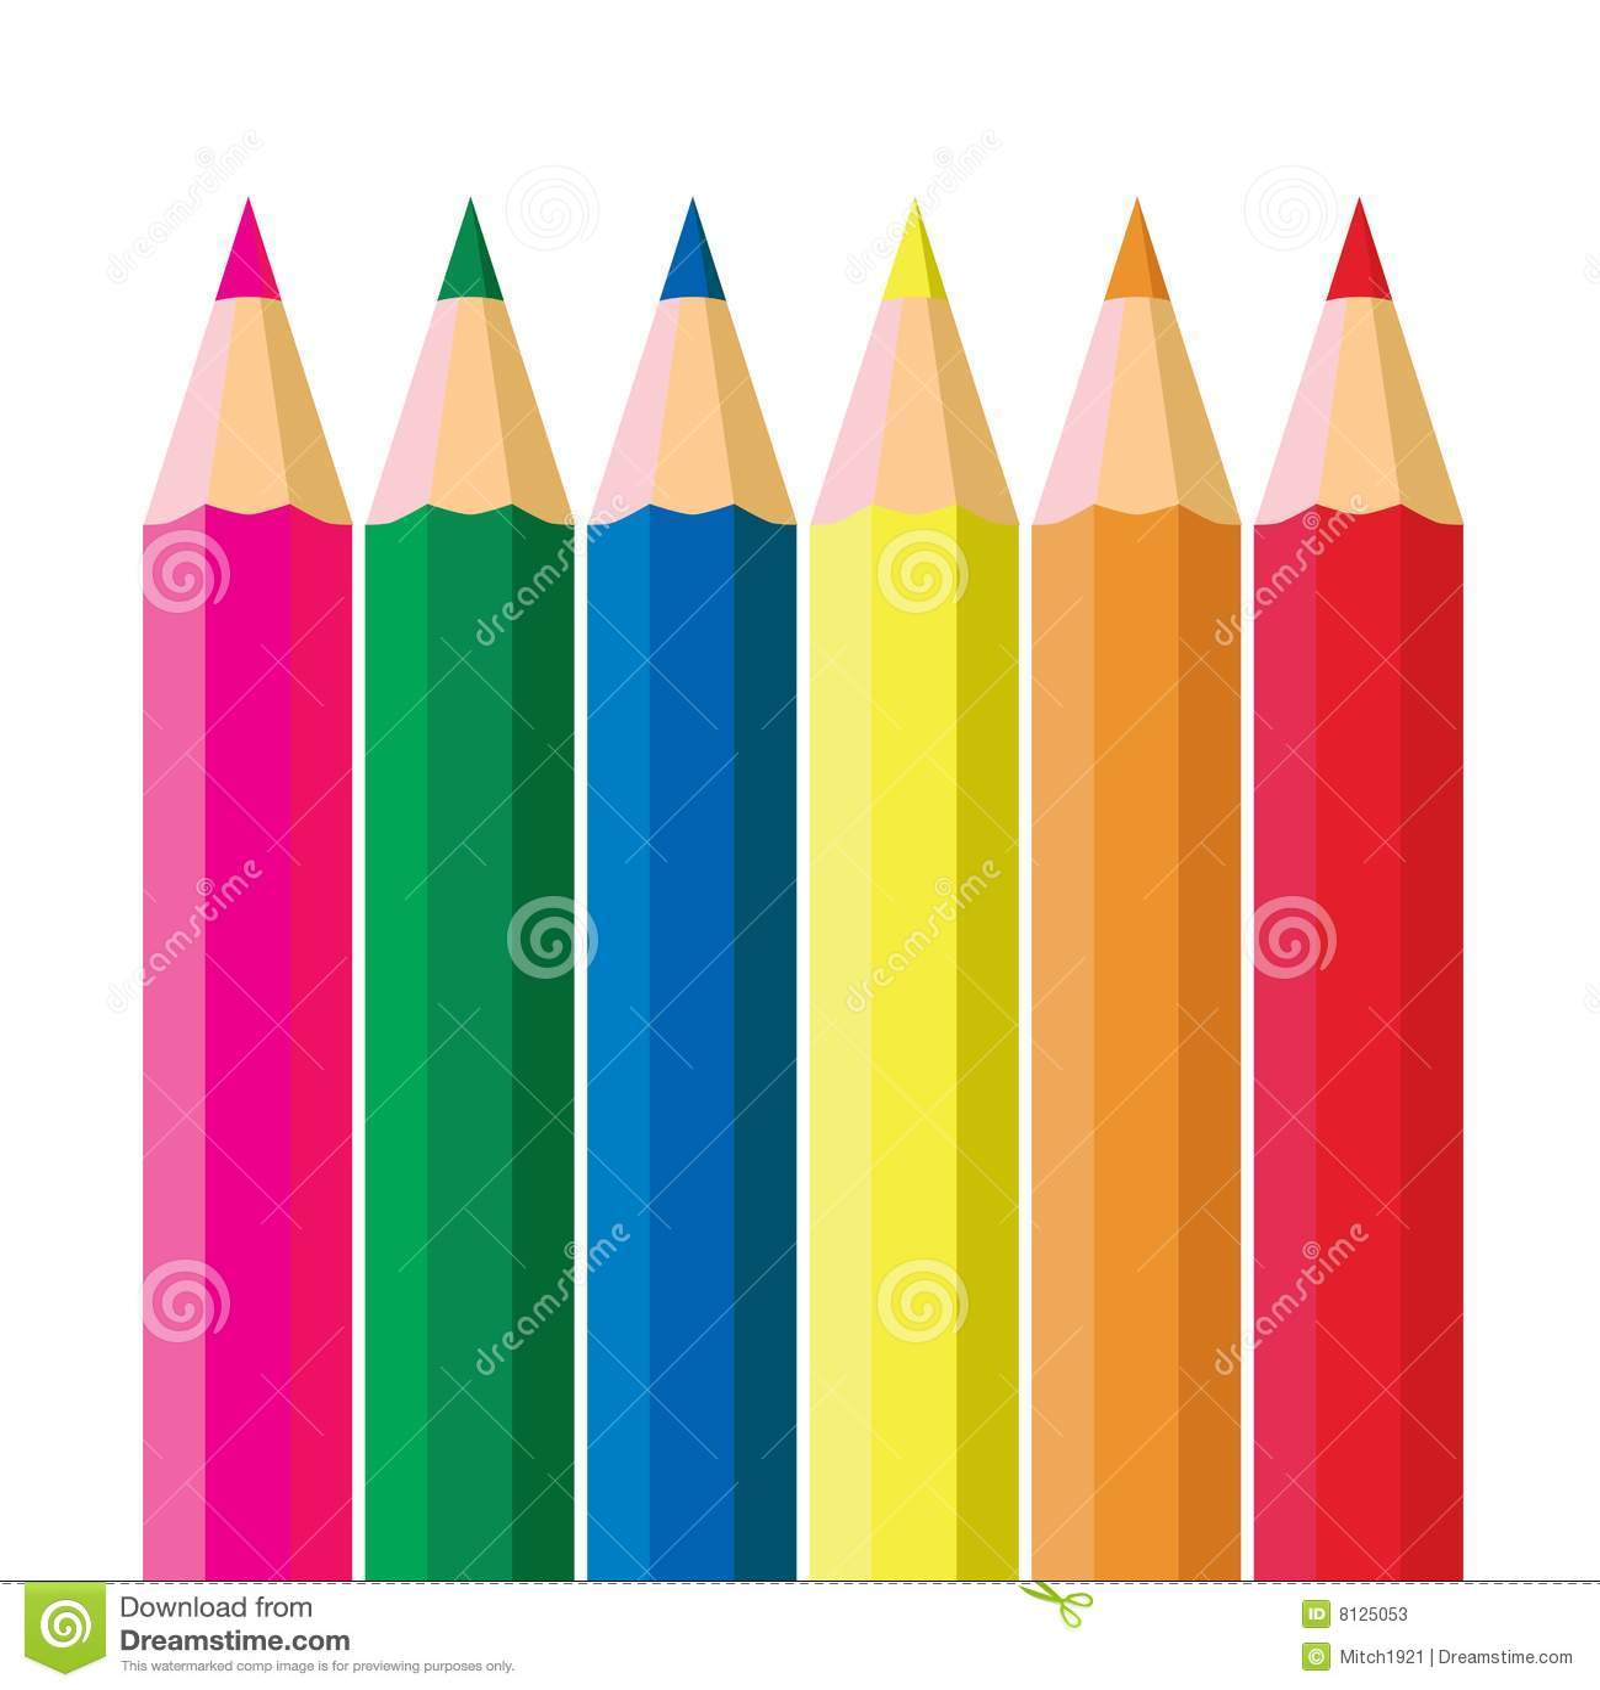 clipart pink crayon